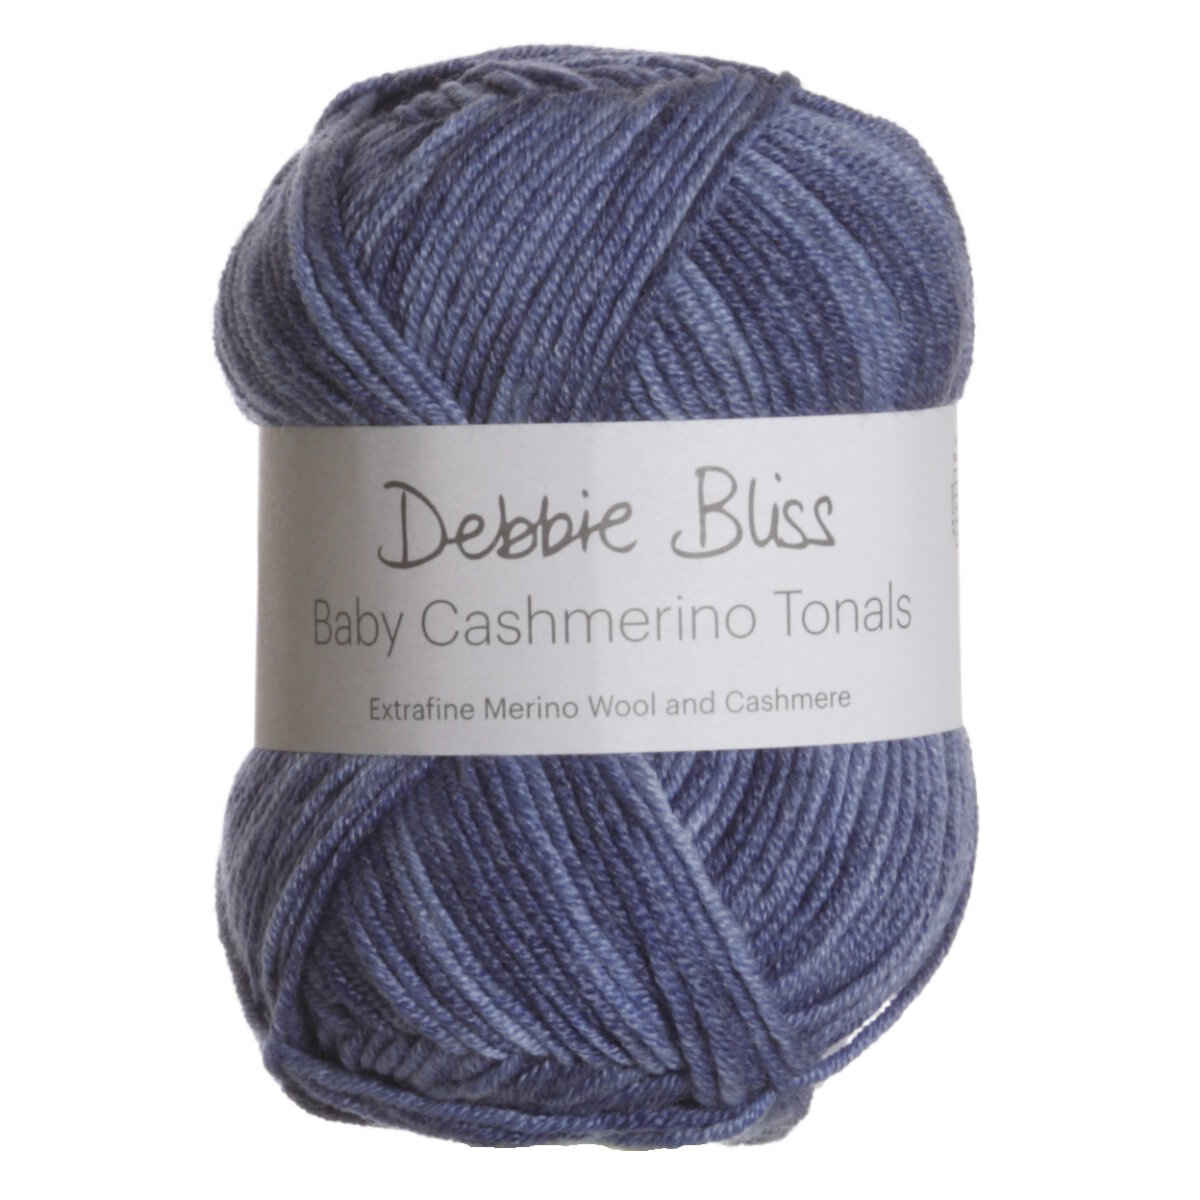 Debbie Bliss Baby Cashmerino Tonals Yarn 01 Storm At